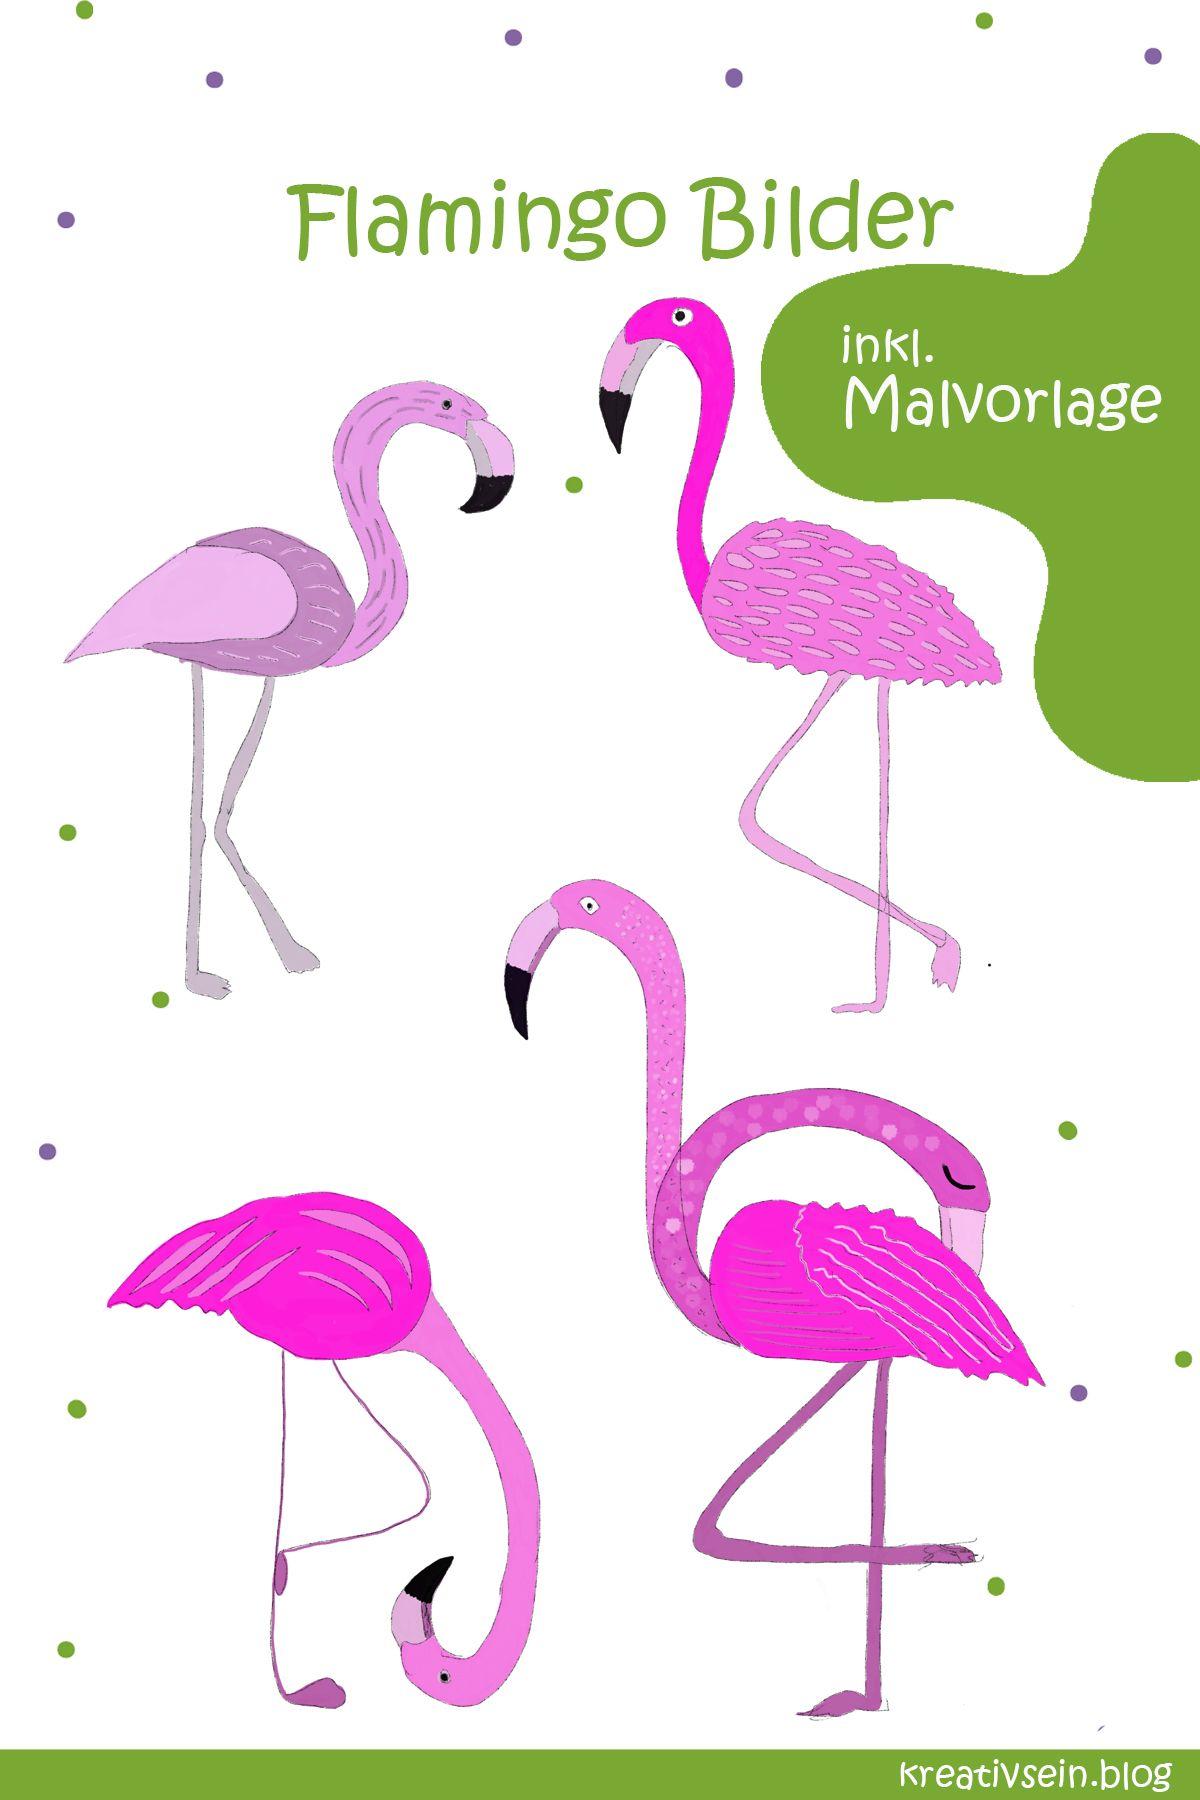 Flamingo Malen für Flamingo Fans - kreativsein.blog  Flamingo